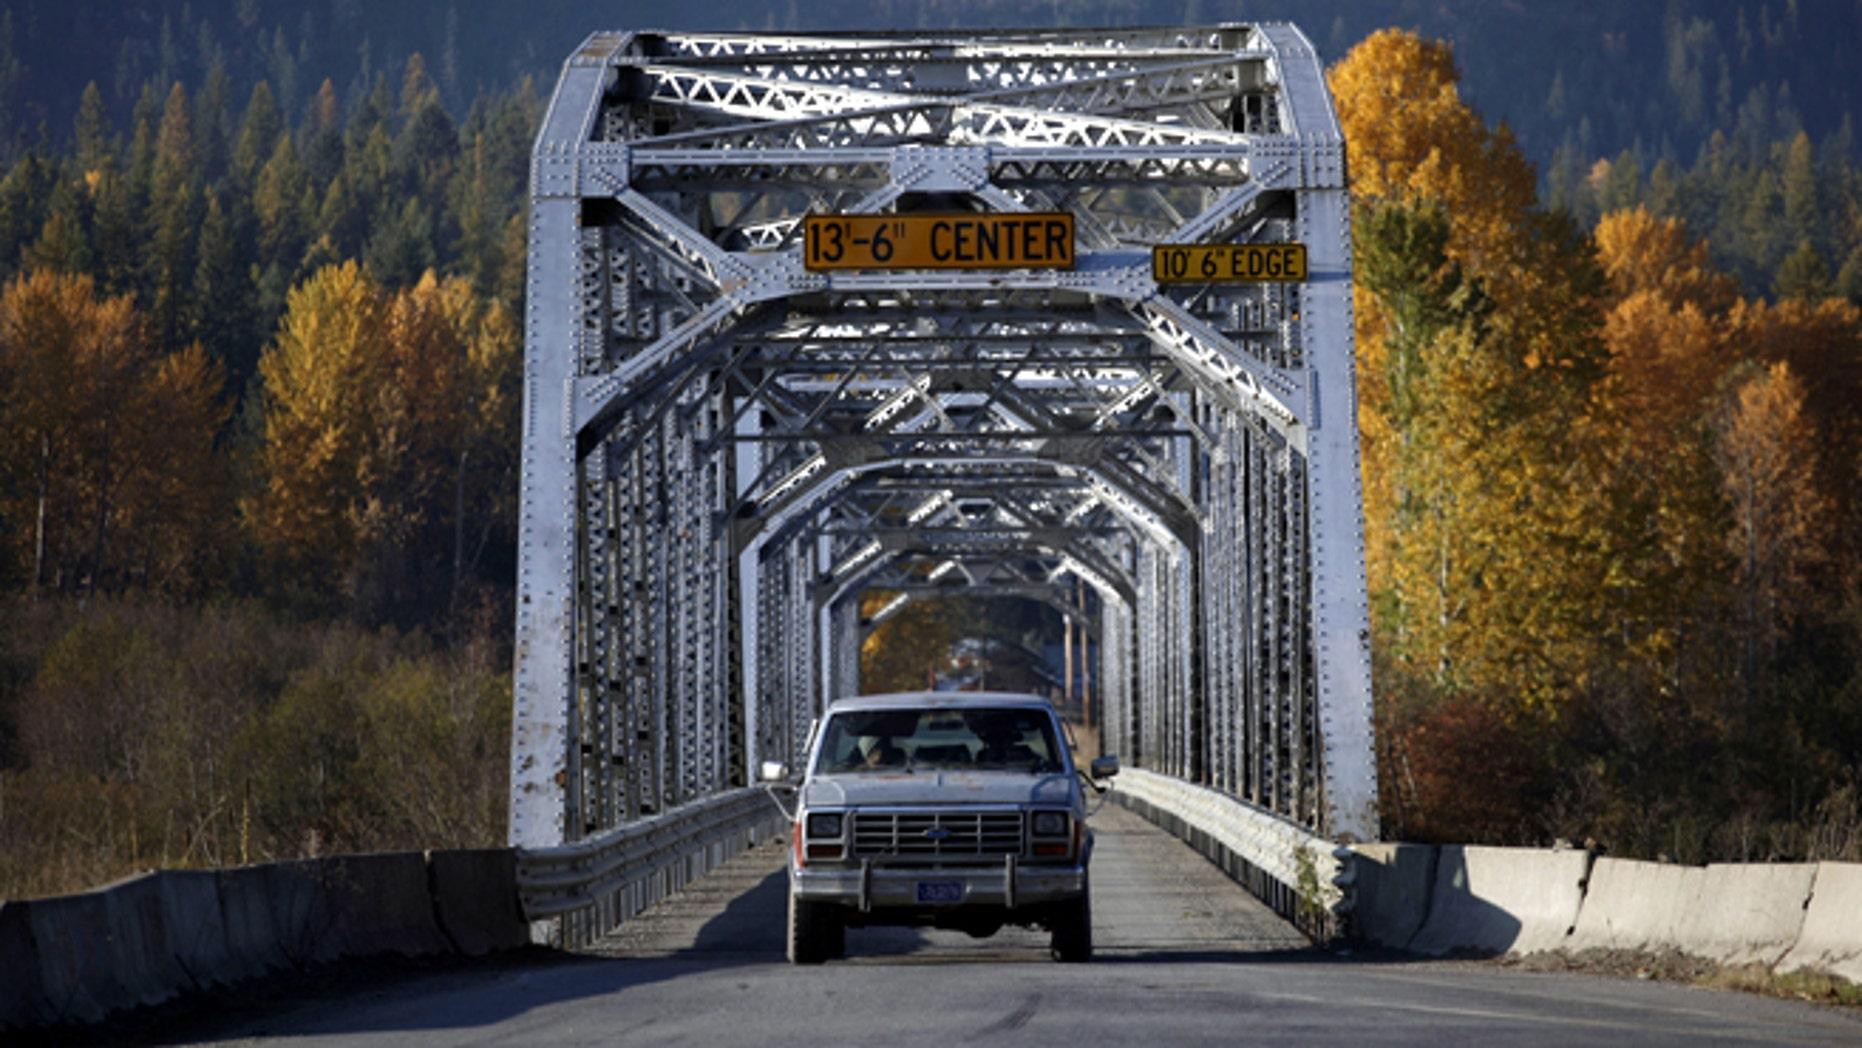 A truck is driven across a one-lane bridge across the Clark Fork River in Noxon, Montana. (REUTERS)